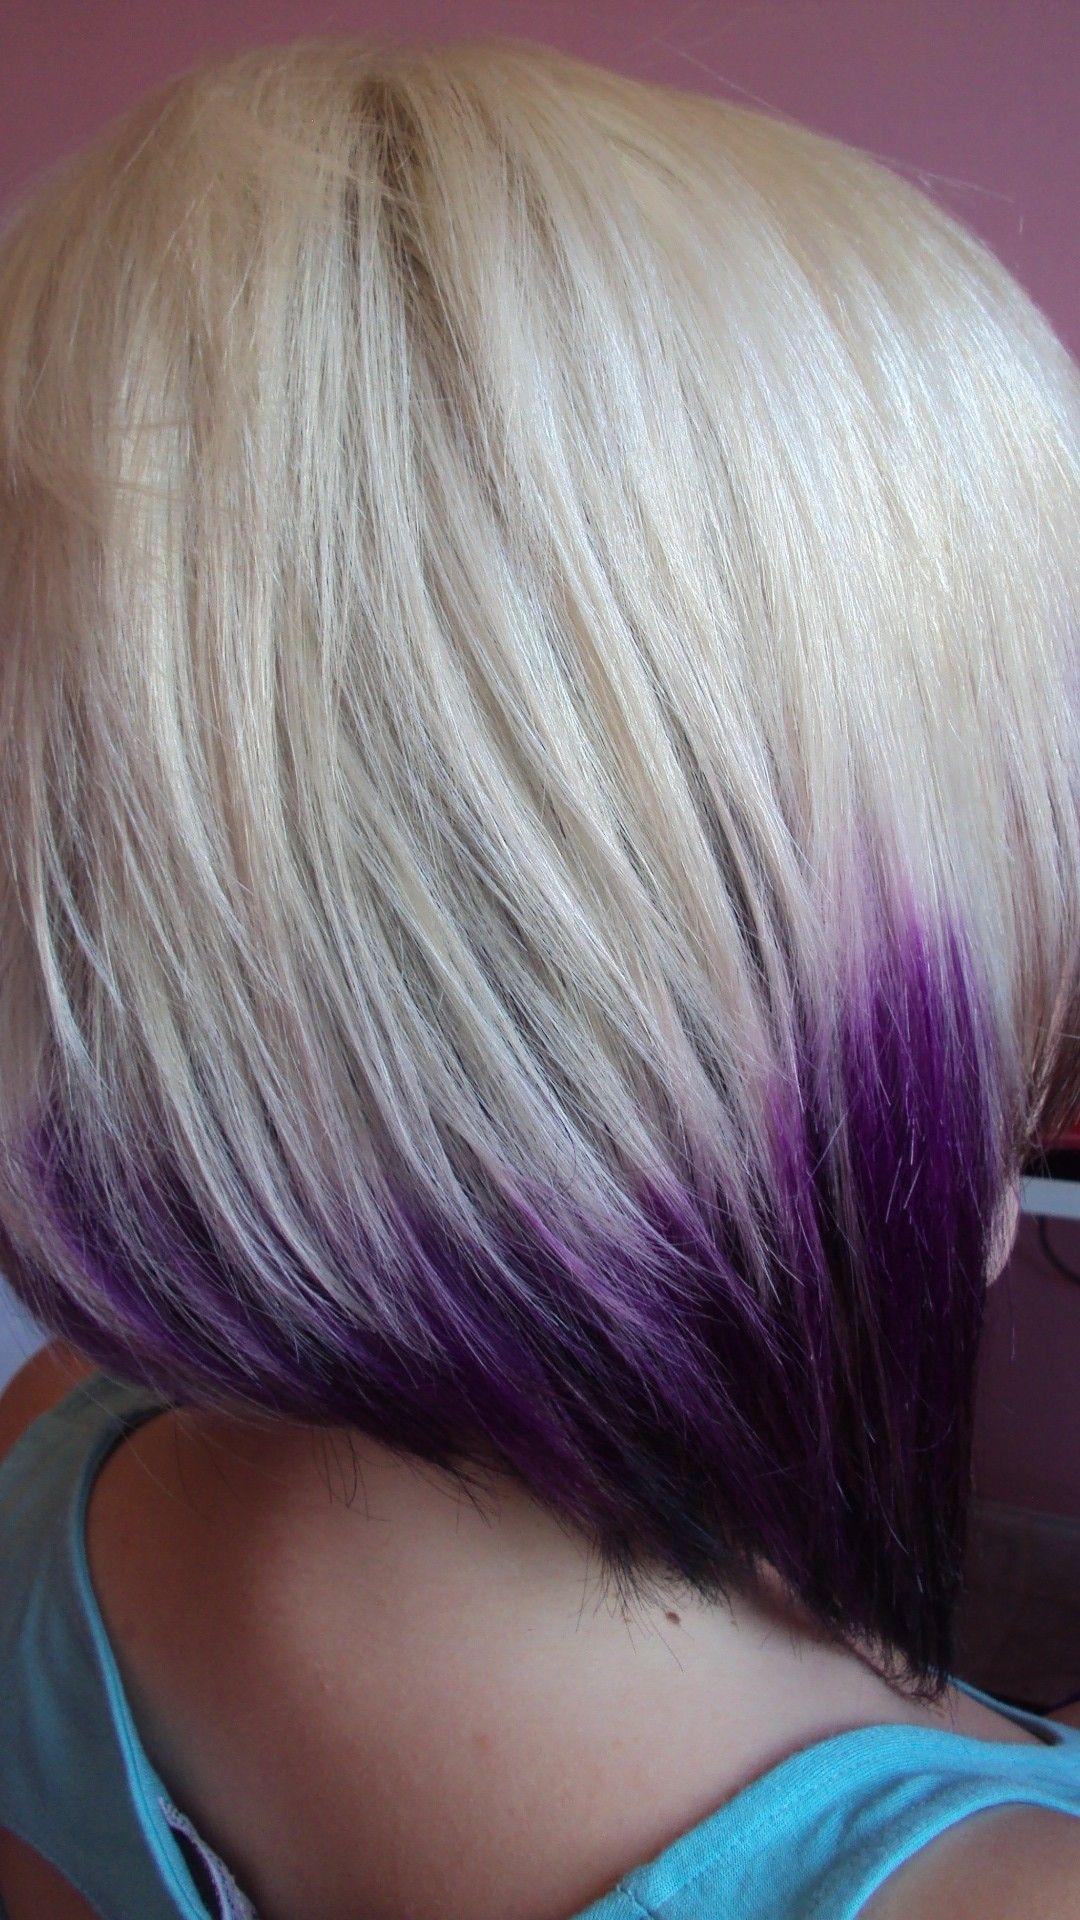 Blonde W Purple Ends Bleach Blonde Hair Blonde Bob Hairstyles Bleach Blonde